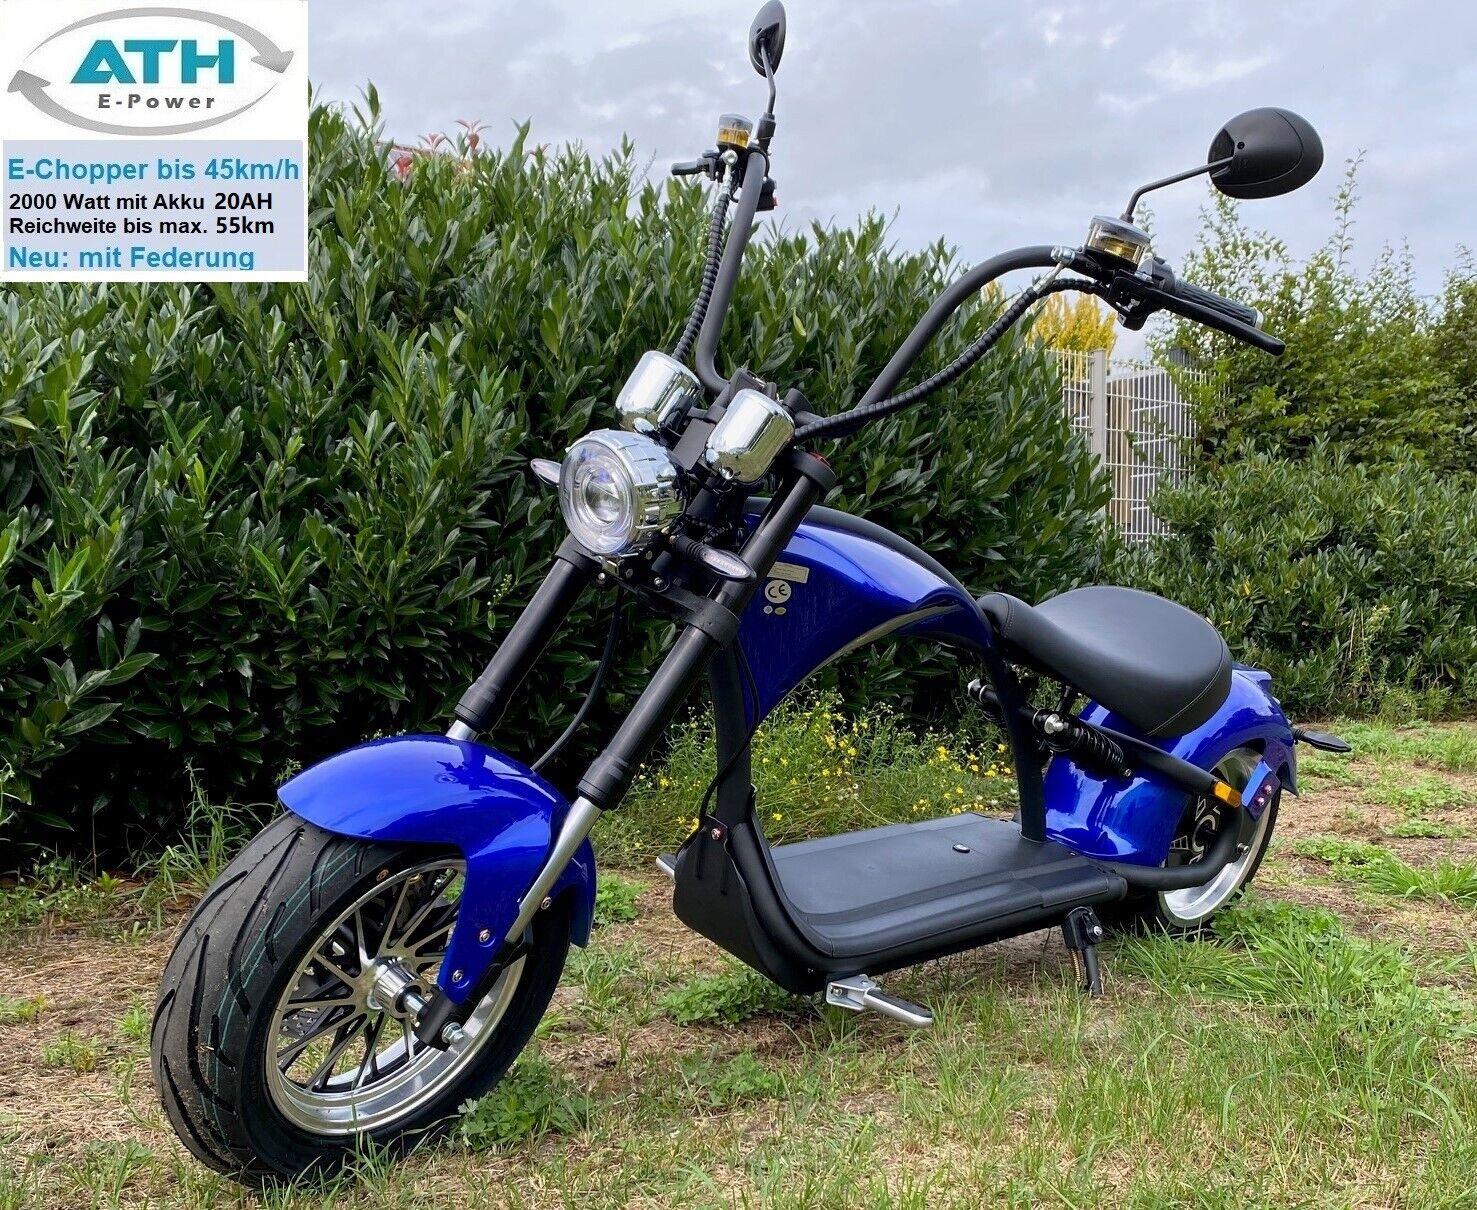 E Roller Elektro Chopper blau 2000W 45km/h 30AH Straßenzulassung Scooter Bike